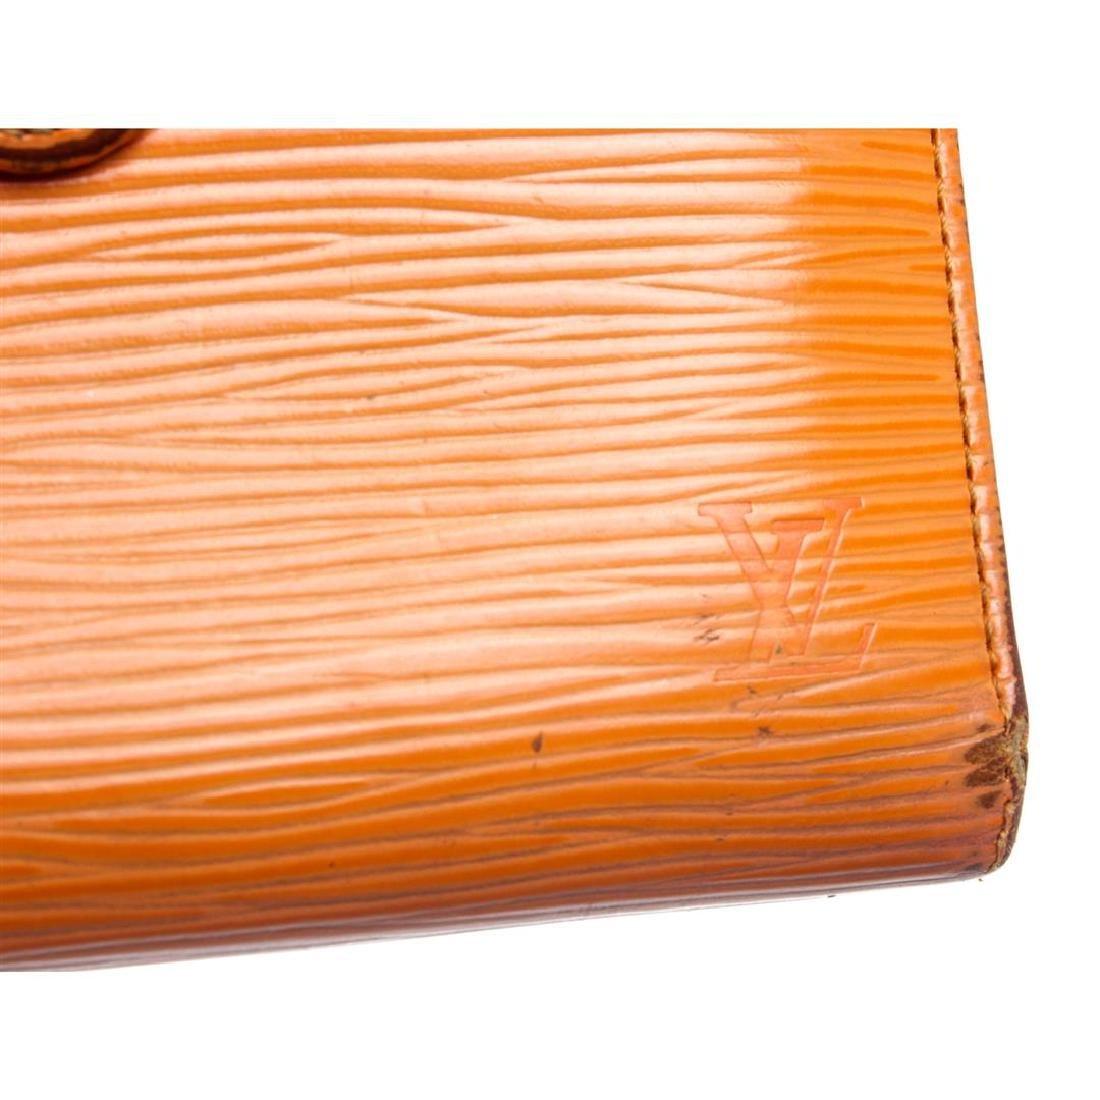 Louis Vuitton Orange Epi Leather French Purse Wallet - 4